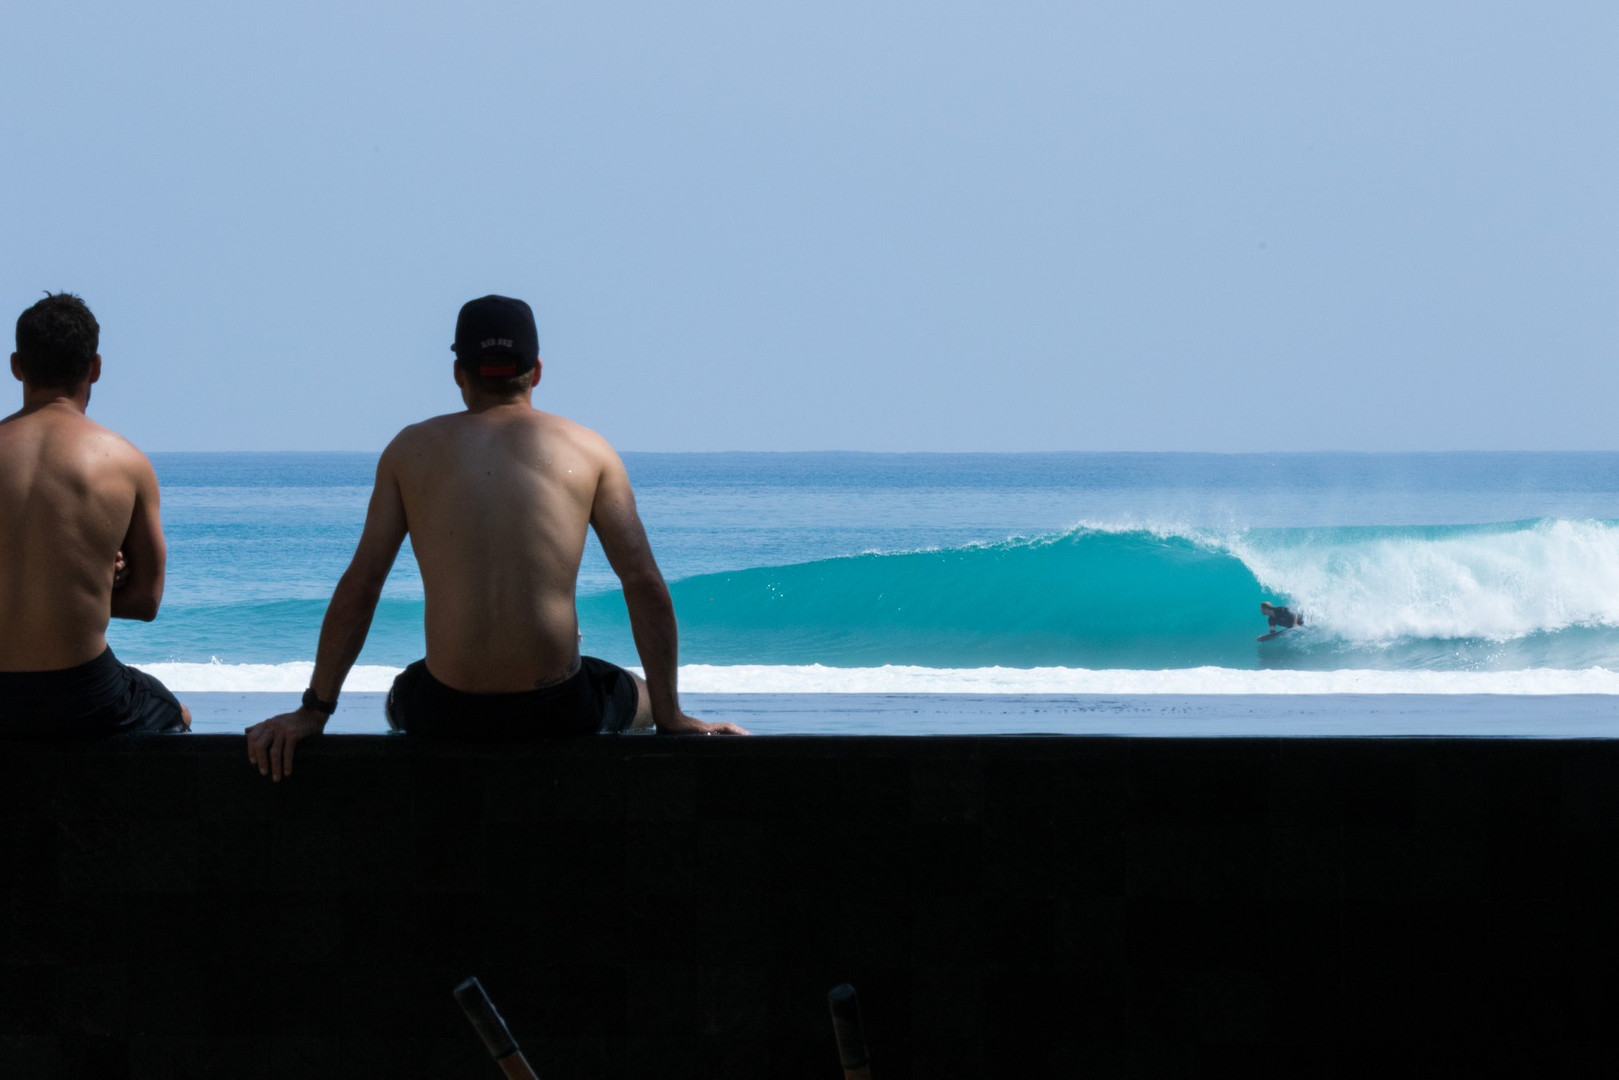 secret-sumatra-surf-camp-bodyboard-krui.